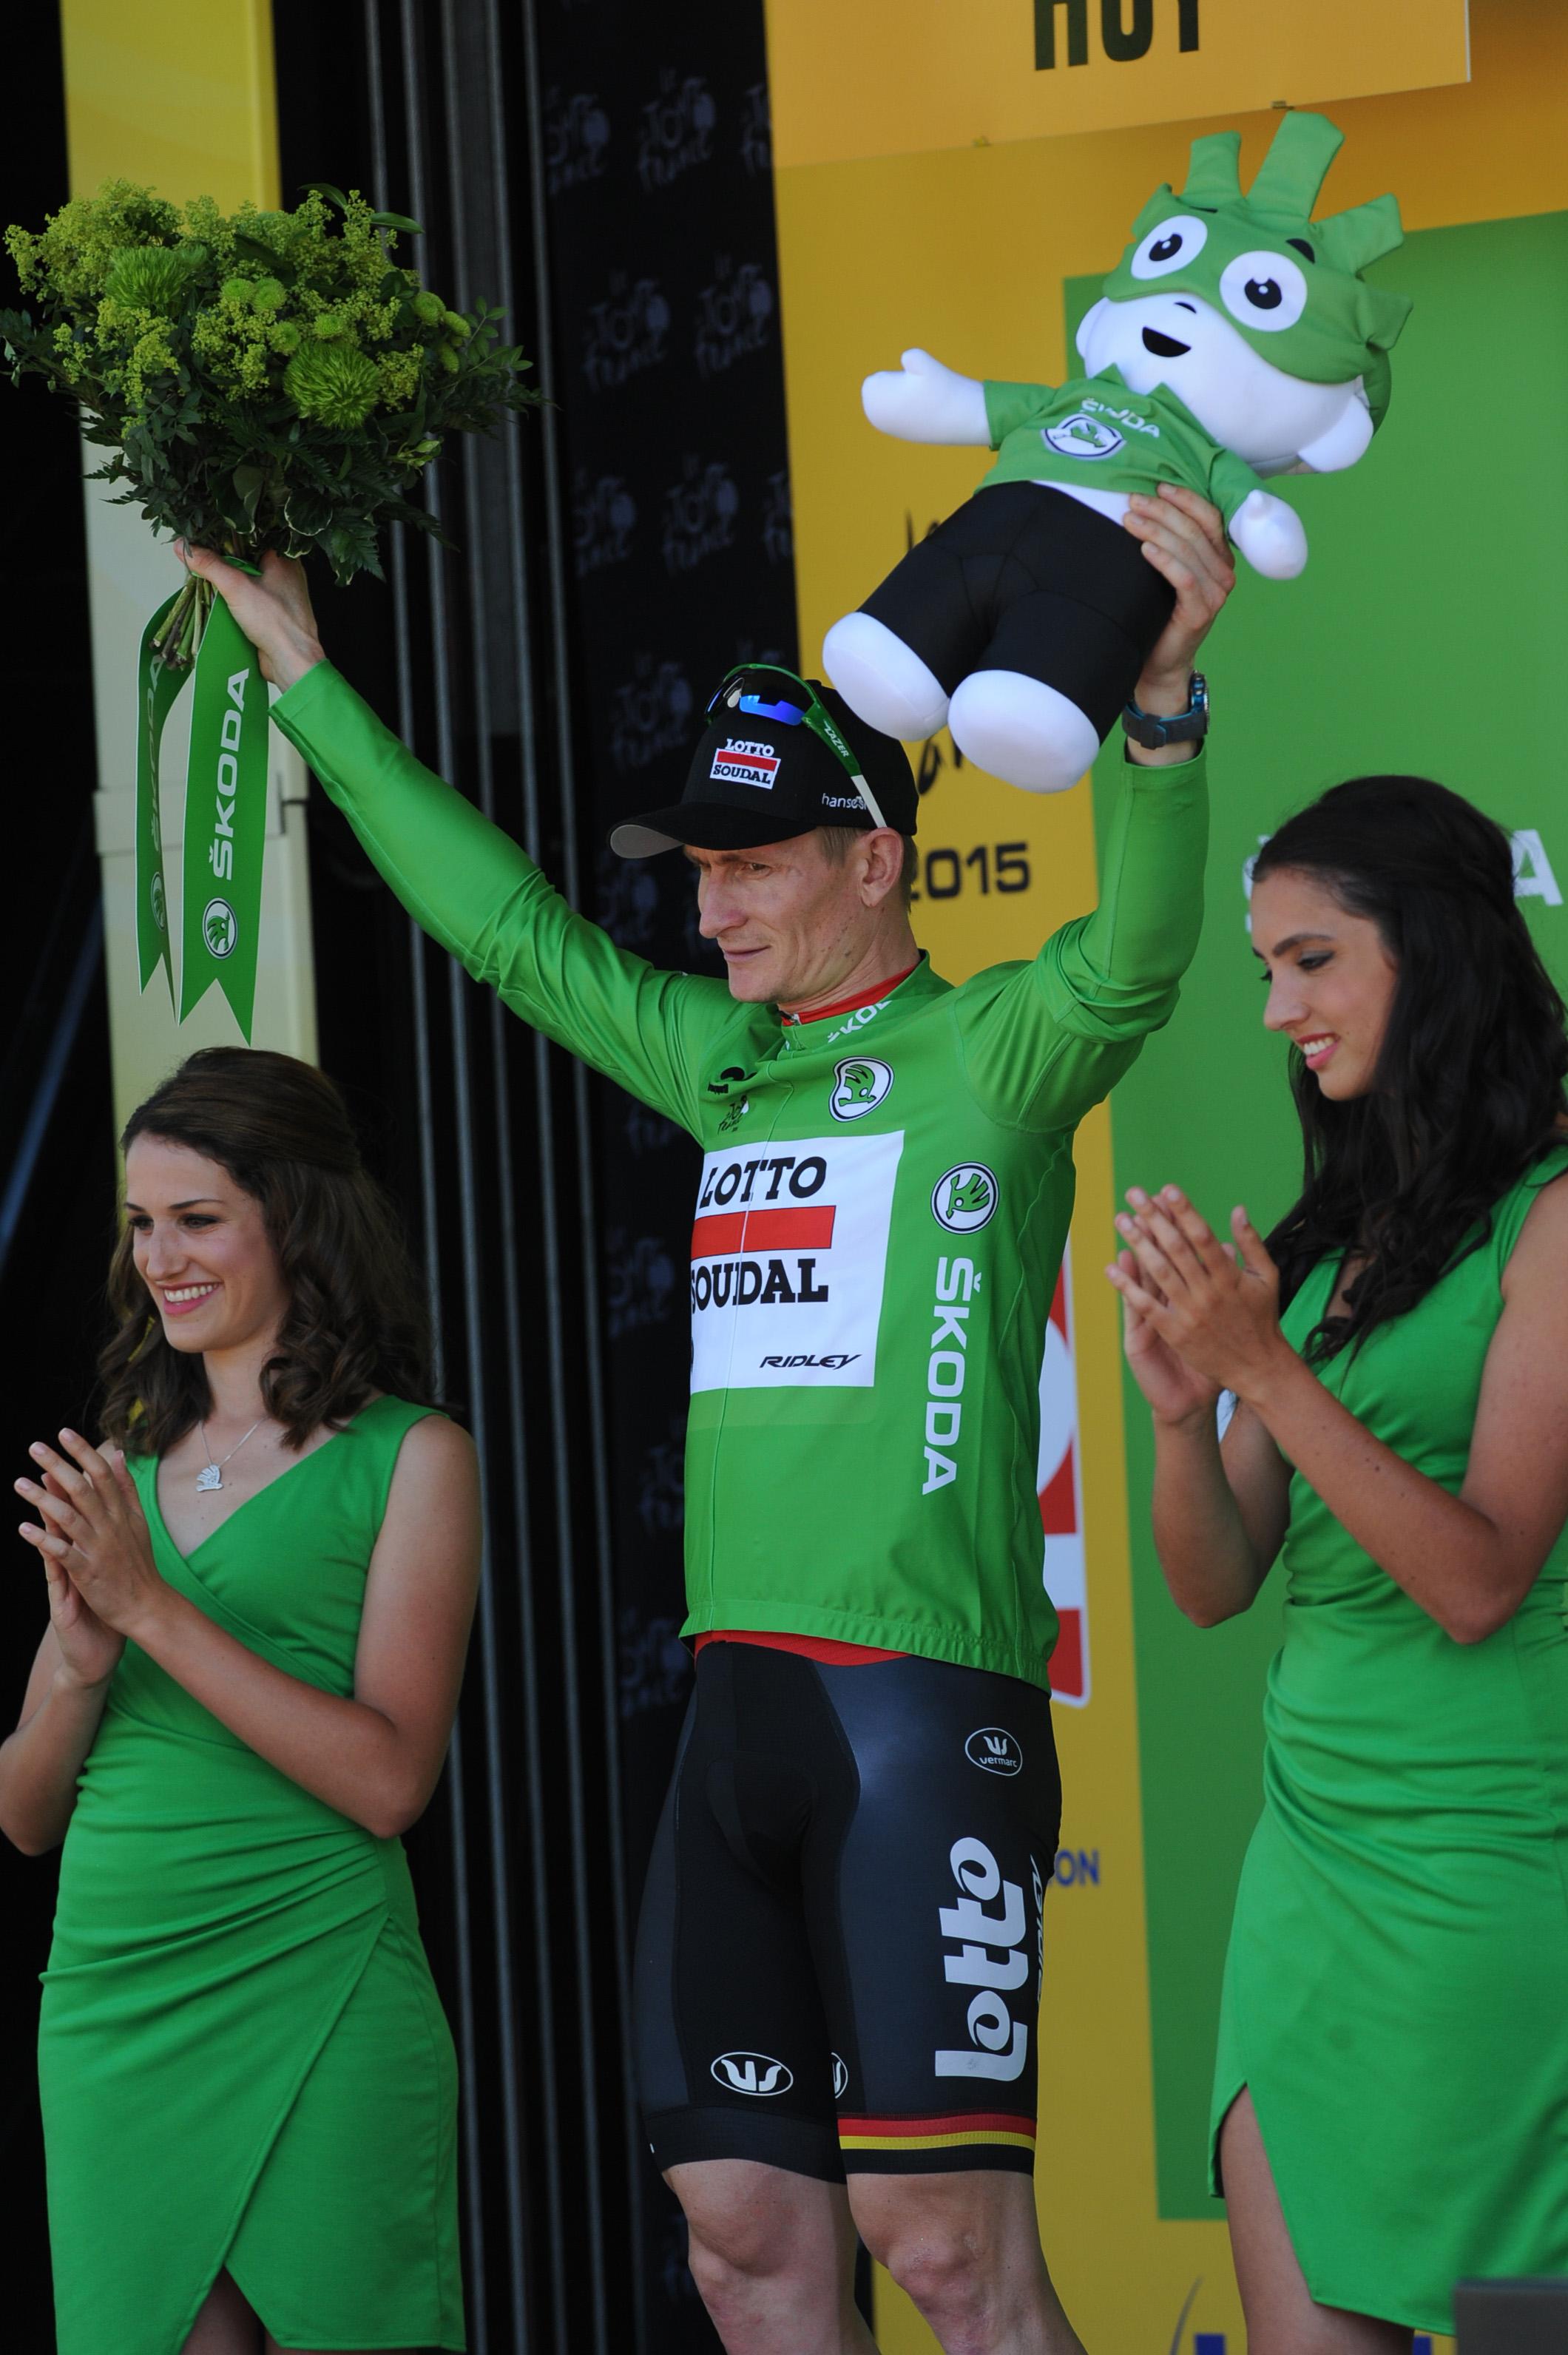 Andre Greipel - Tour de France 2015 - 3. Etappe. (pic: Sirotti)